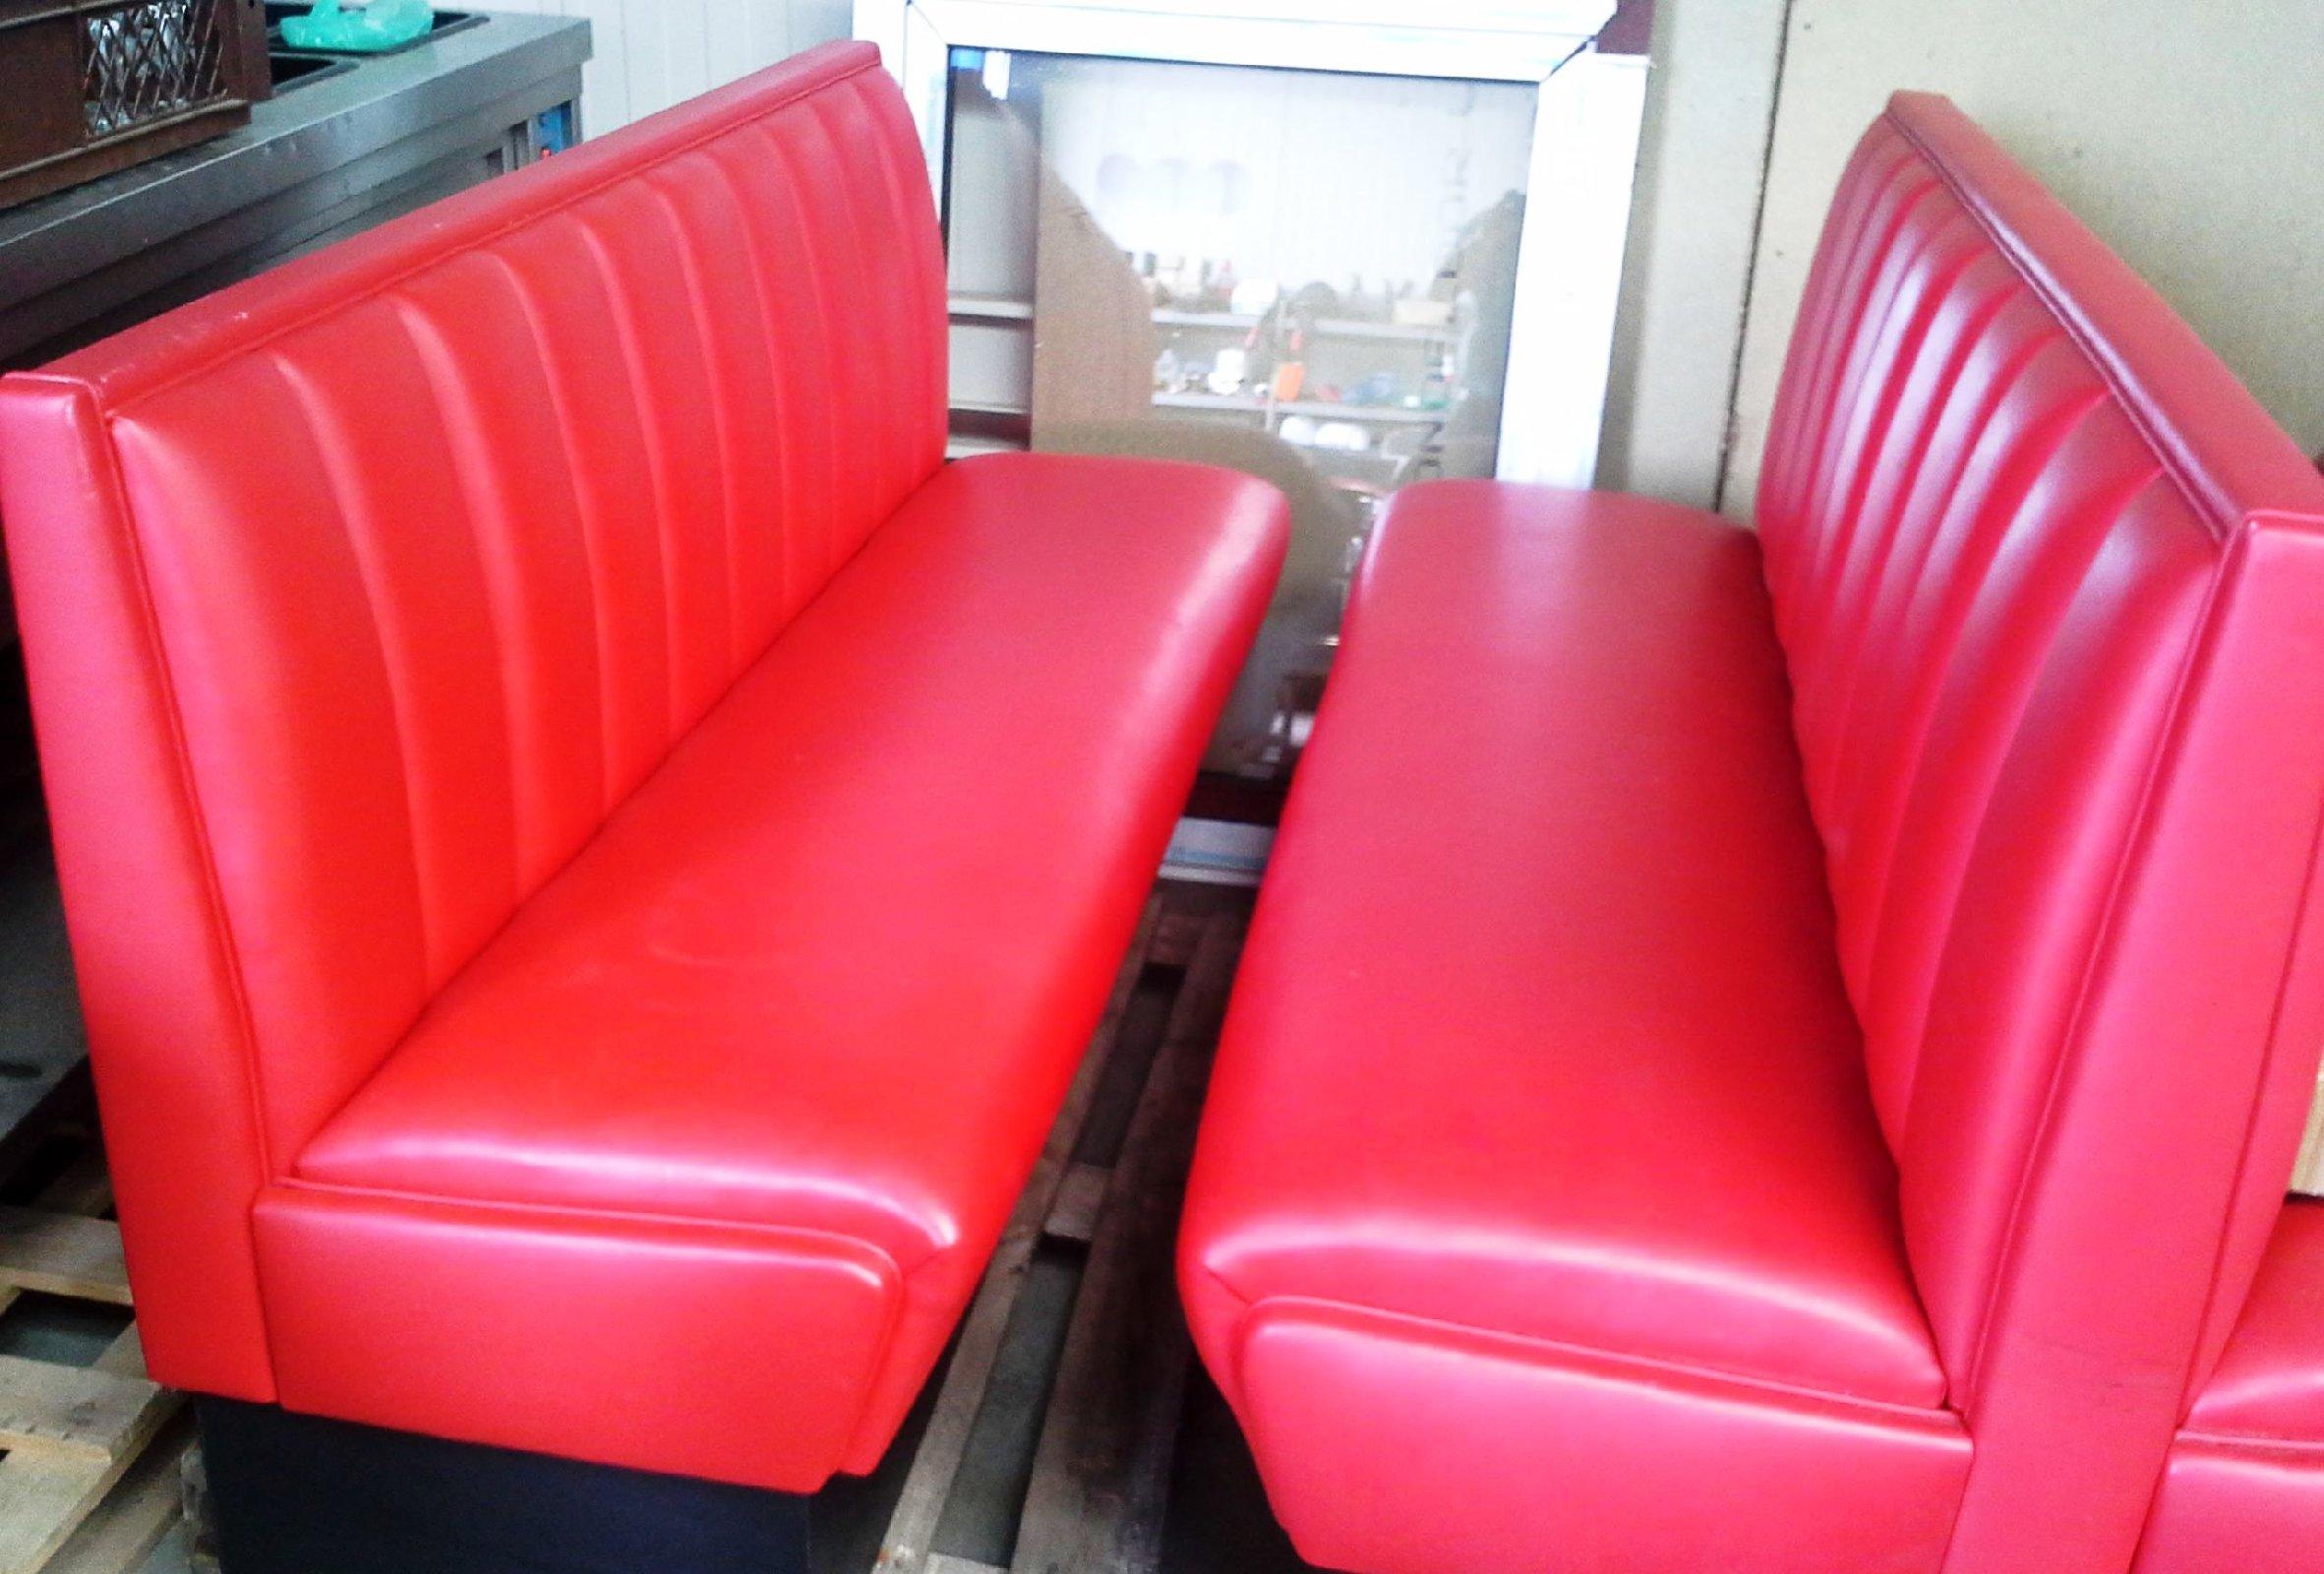 american diner bistro m bel sitzbank hocker tisch stehtisch bank sitzm bel stuhl ebay. Black Bedroom Furniture Sets. Home Design Ideas